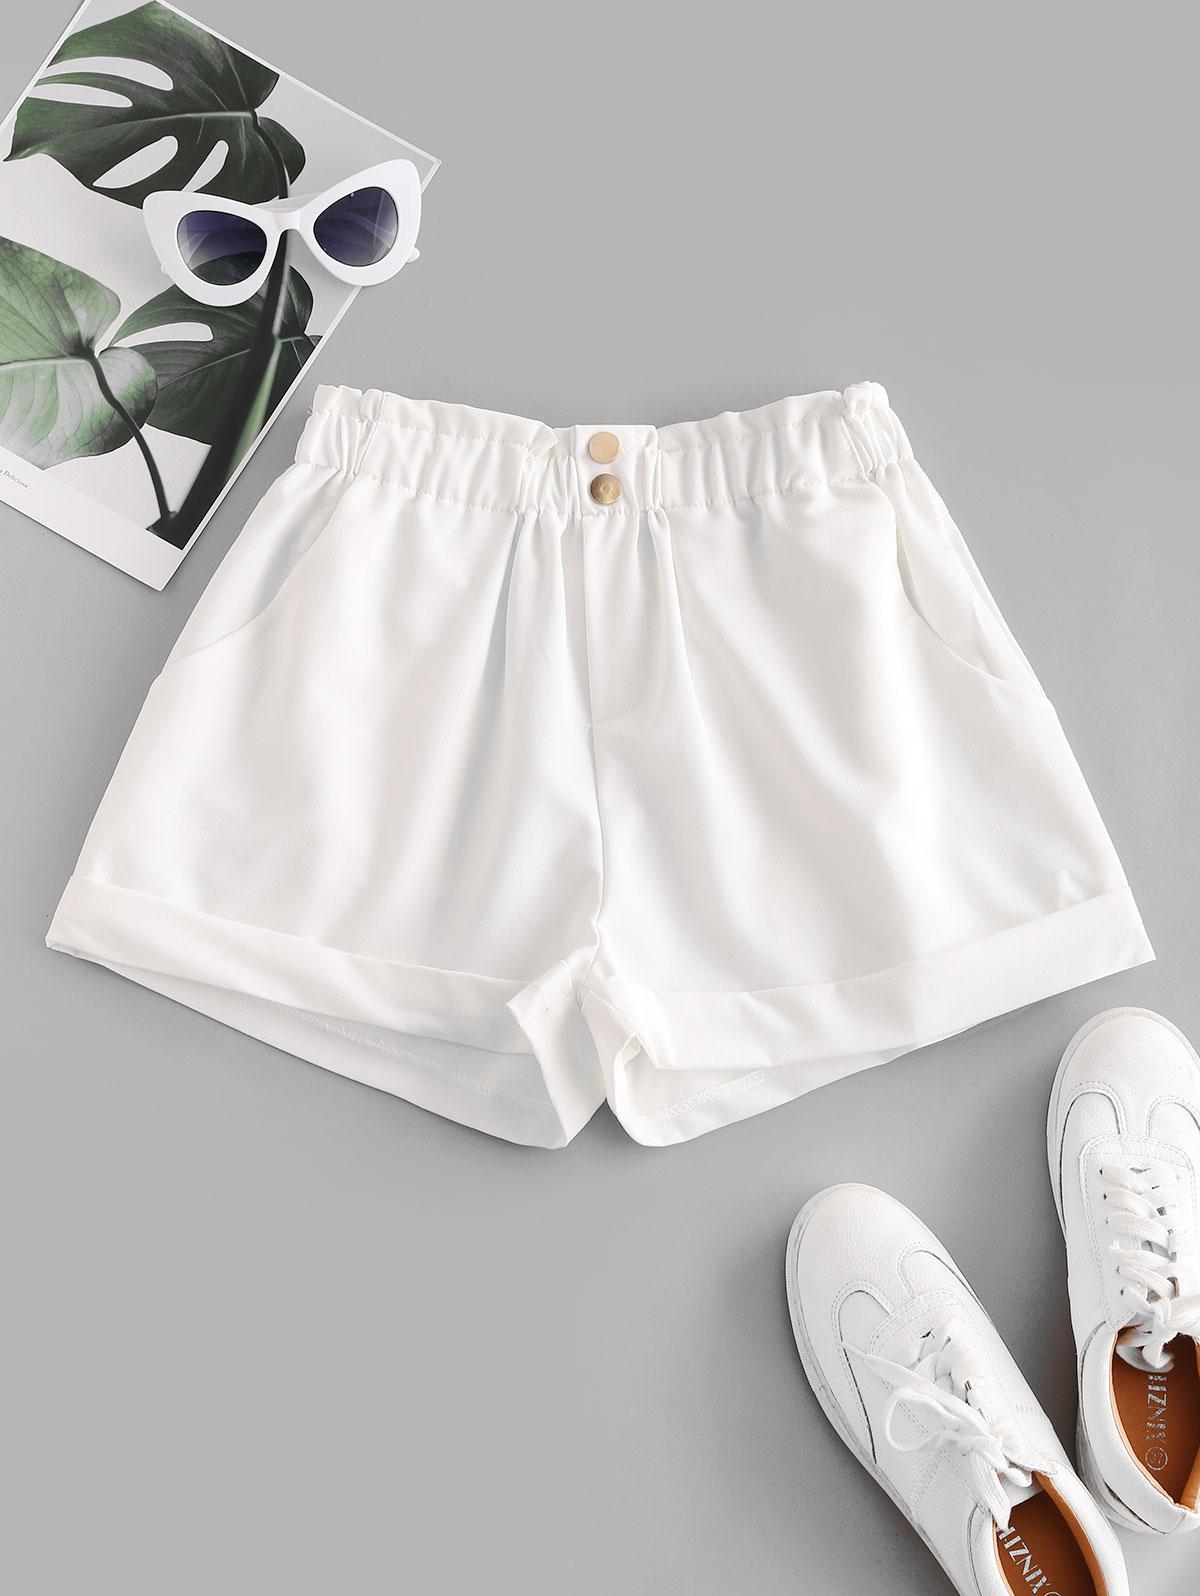 ZAFUL Pockets Two Buttoned Cuffed Hem Paperbag Shorts, White